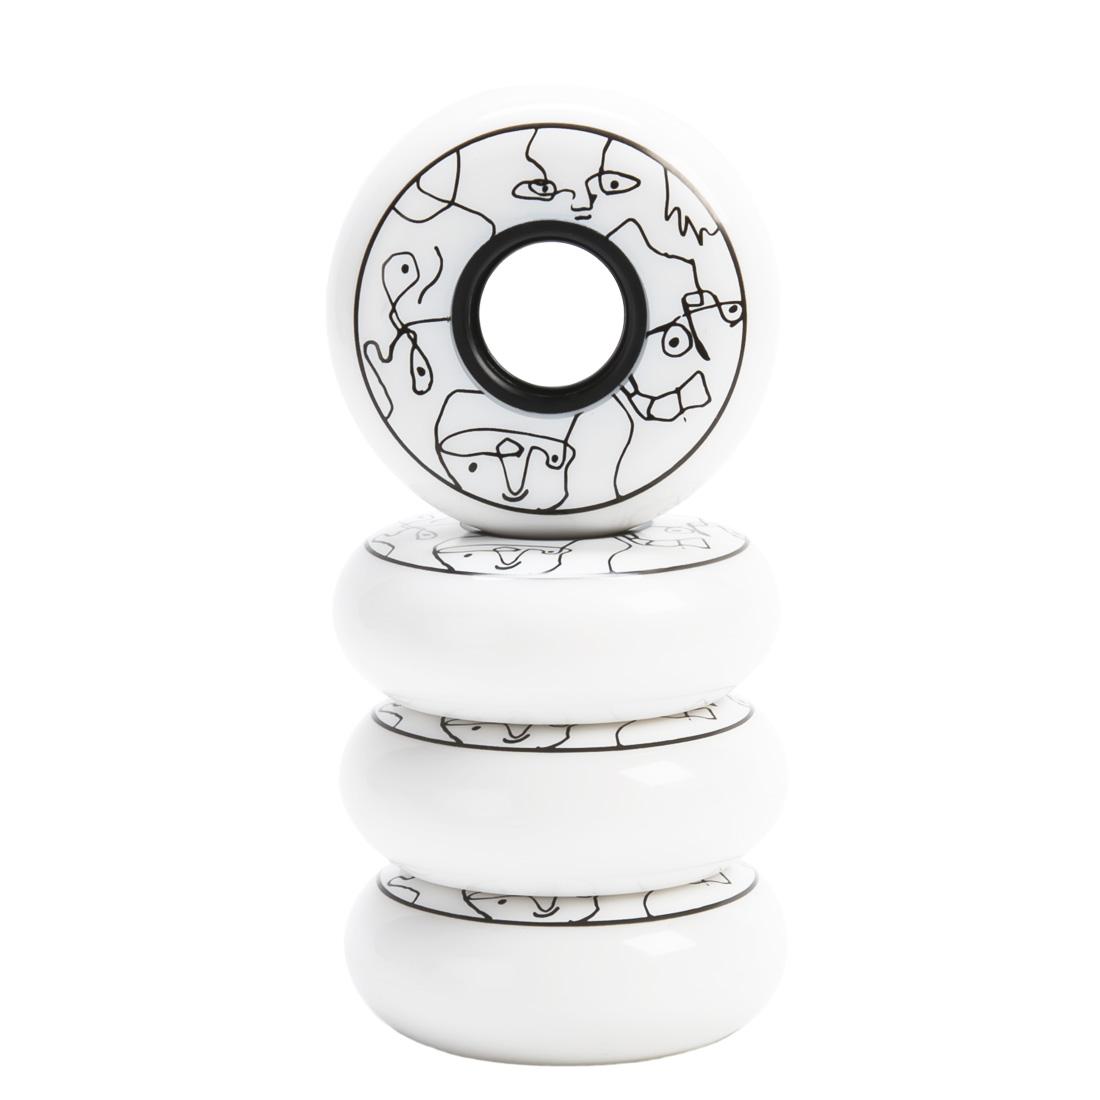 белые колеса для роликов Trippy White 64 мм на белом фоне